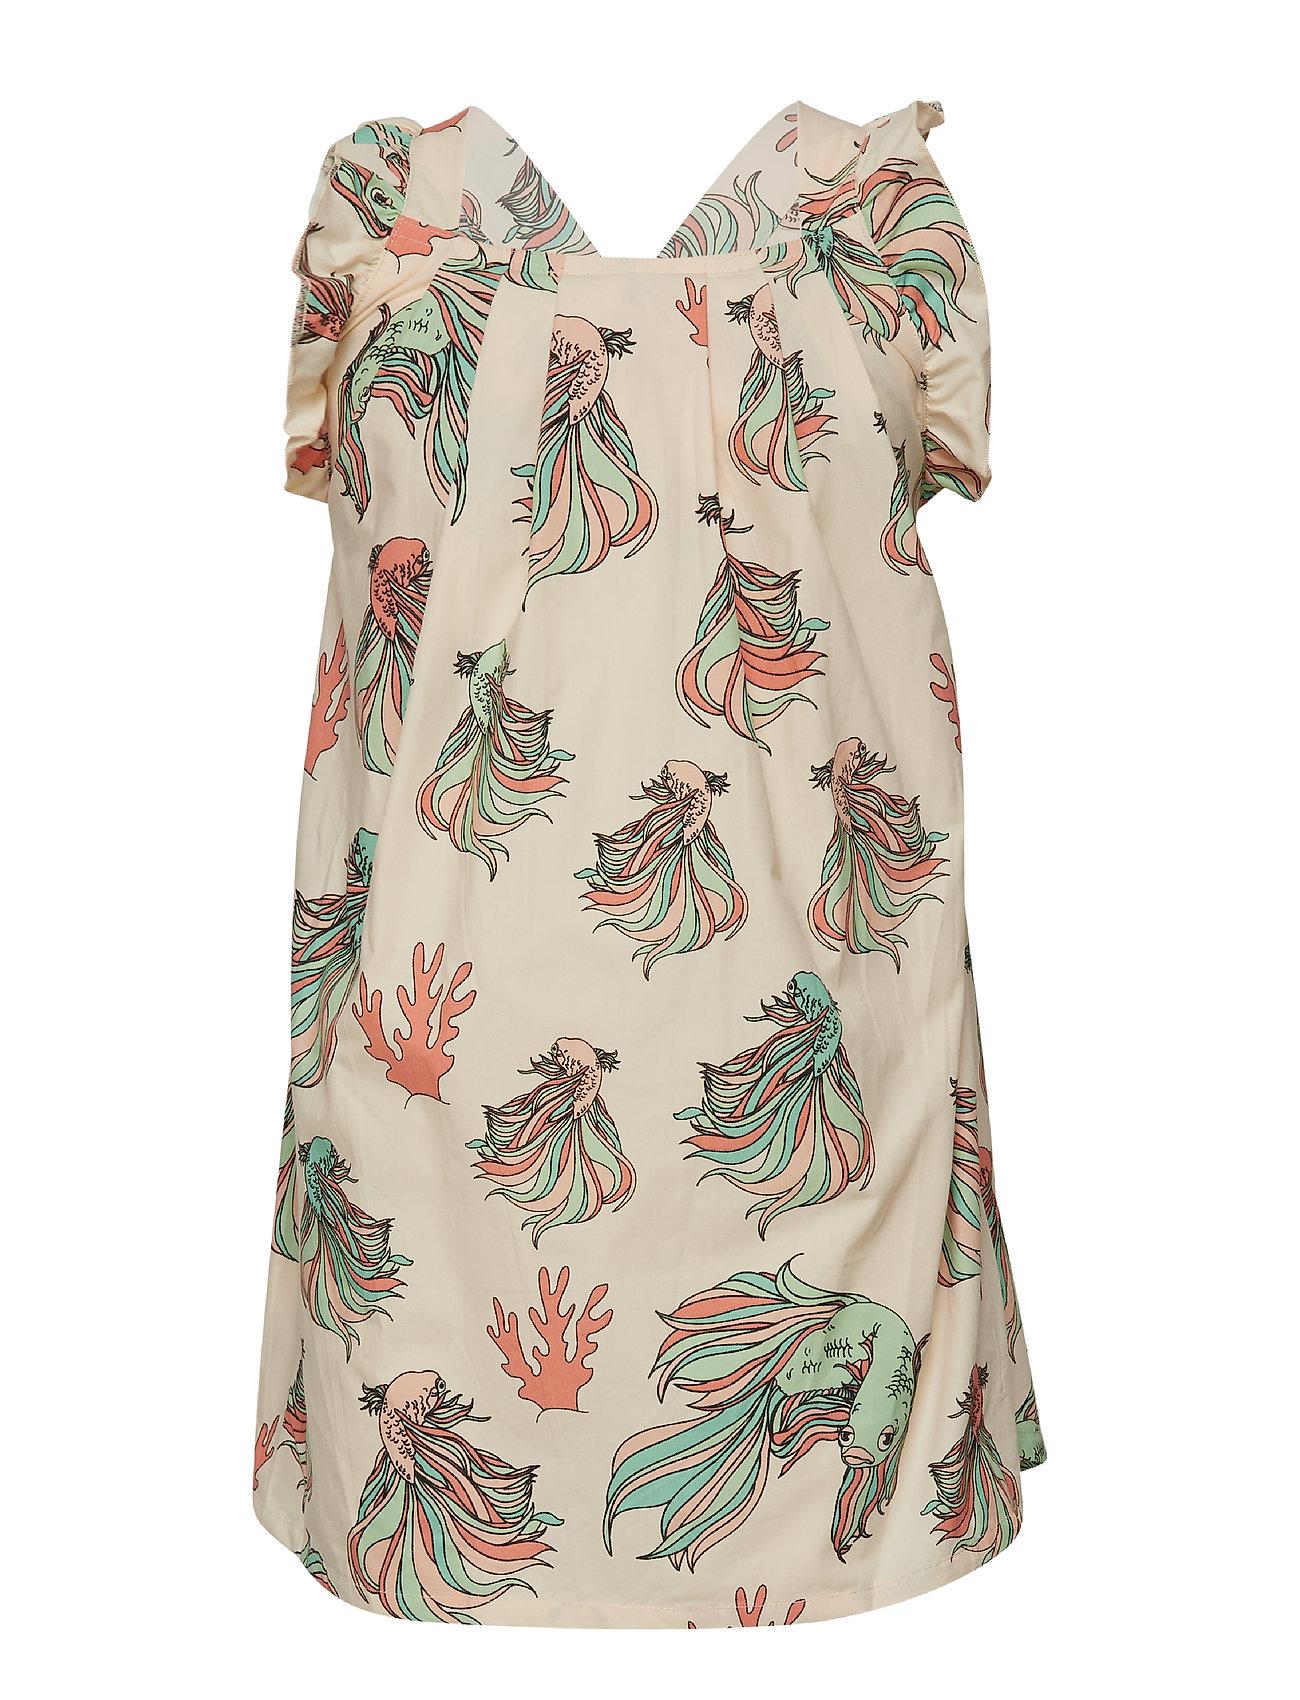 Tao & friends Ruffles Dress multi-animal - BEIGE